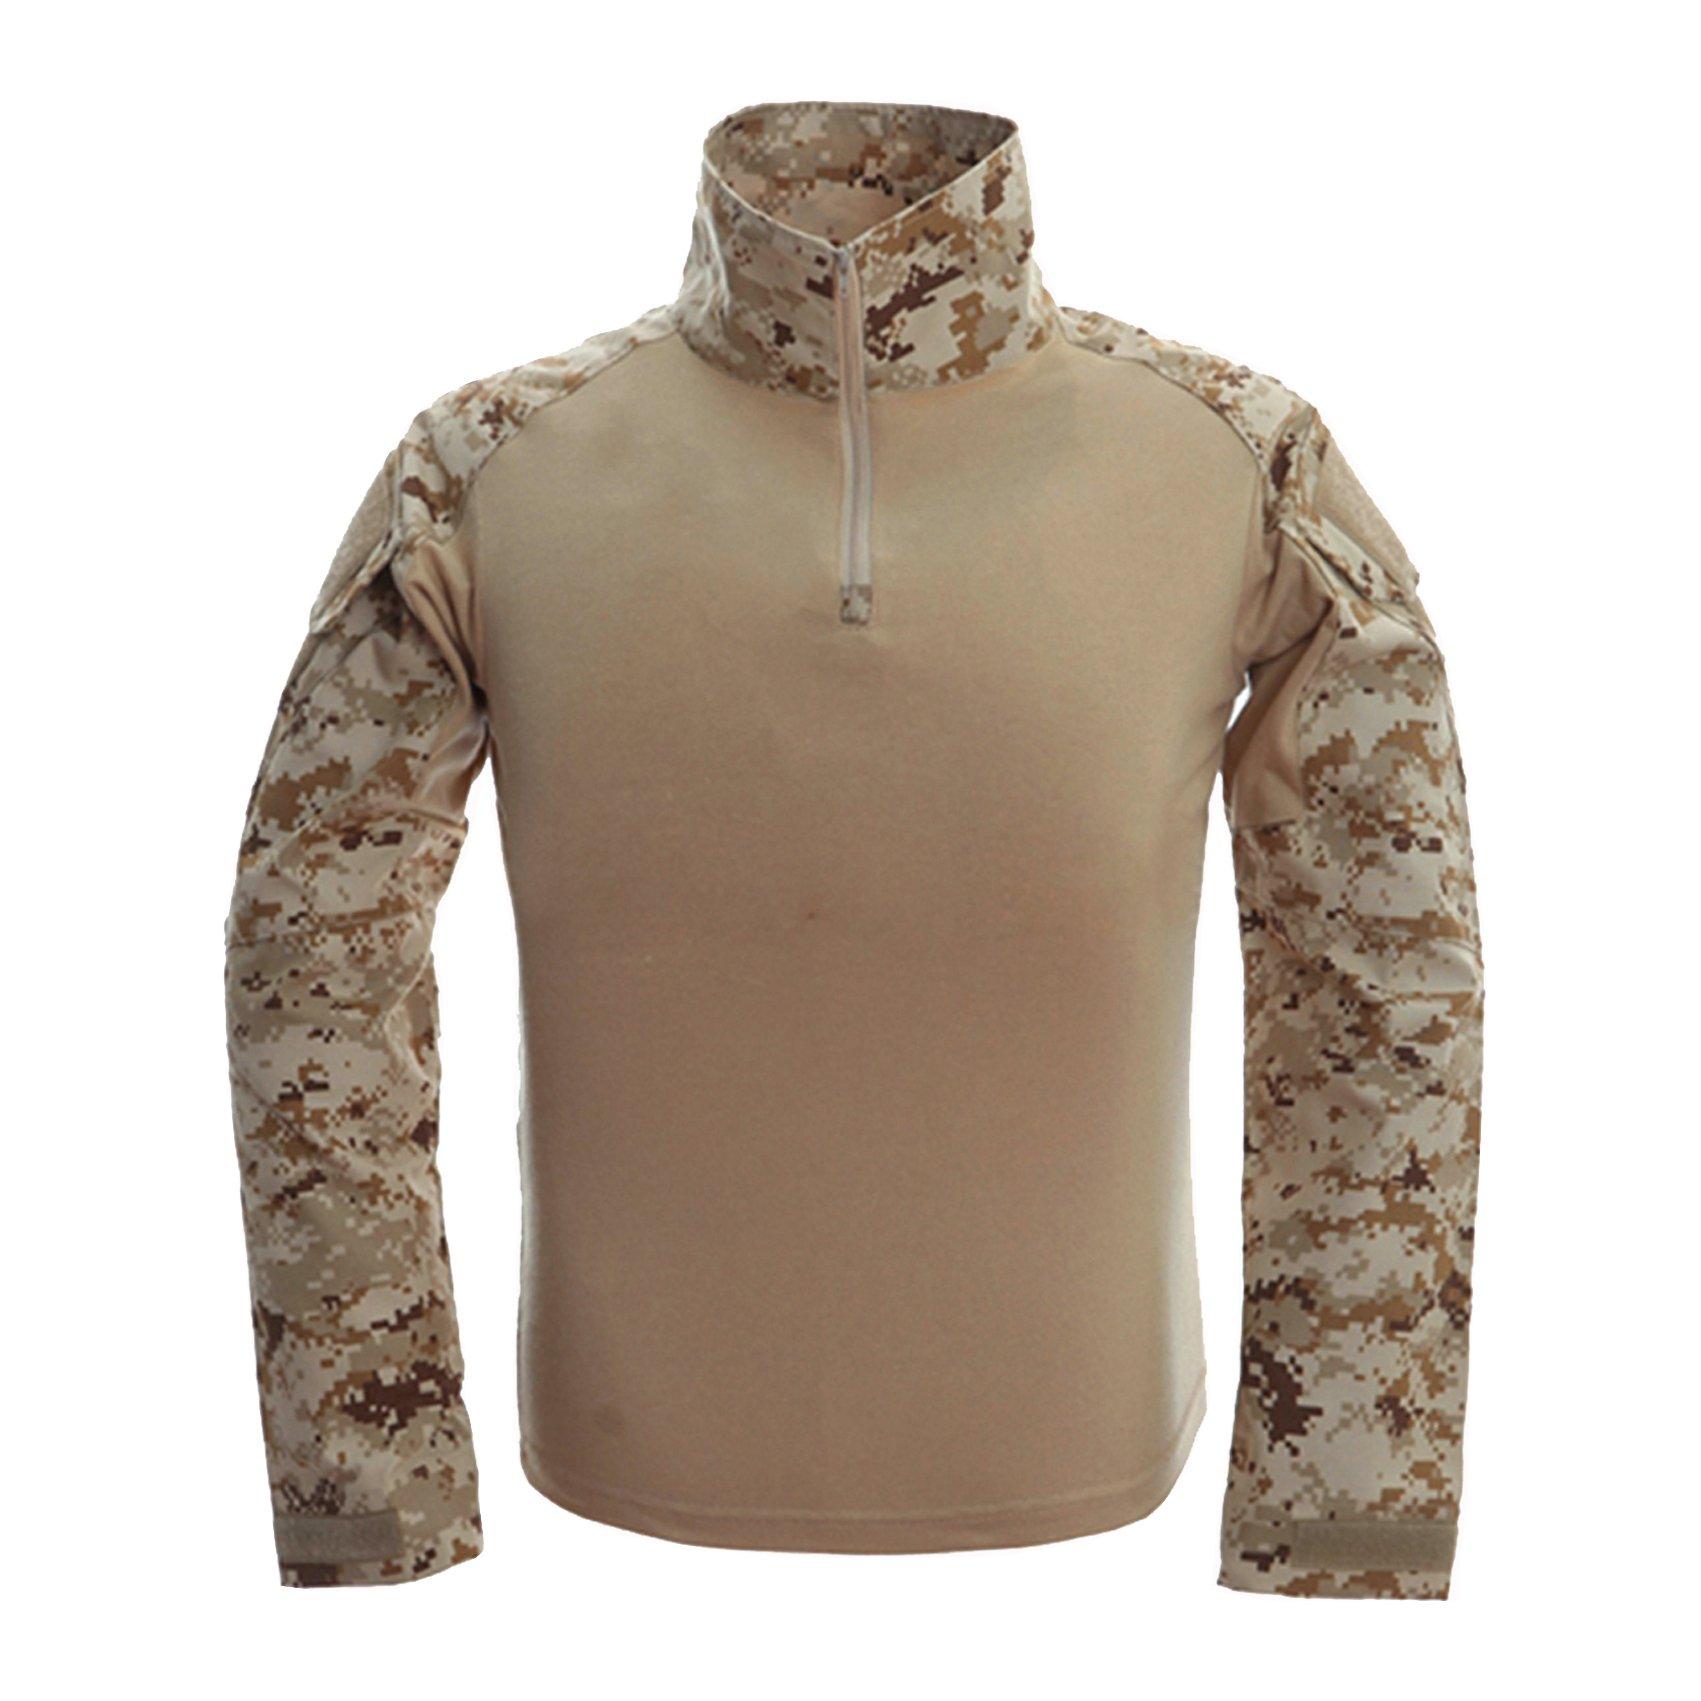 MAGCOMSEN Camo Shirts for Men Military Shirts Tactical Shirts Polo Shirts Golf Shirts Casual Shirts T Shirts Camping Hiking Shirts by MAGCOMSEN